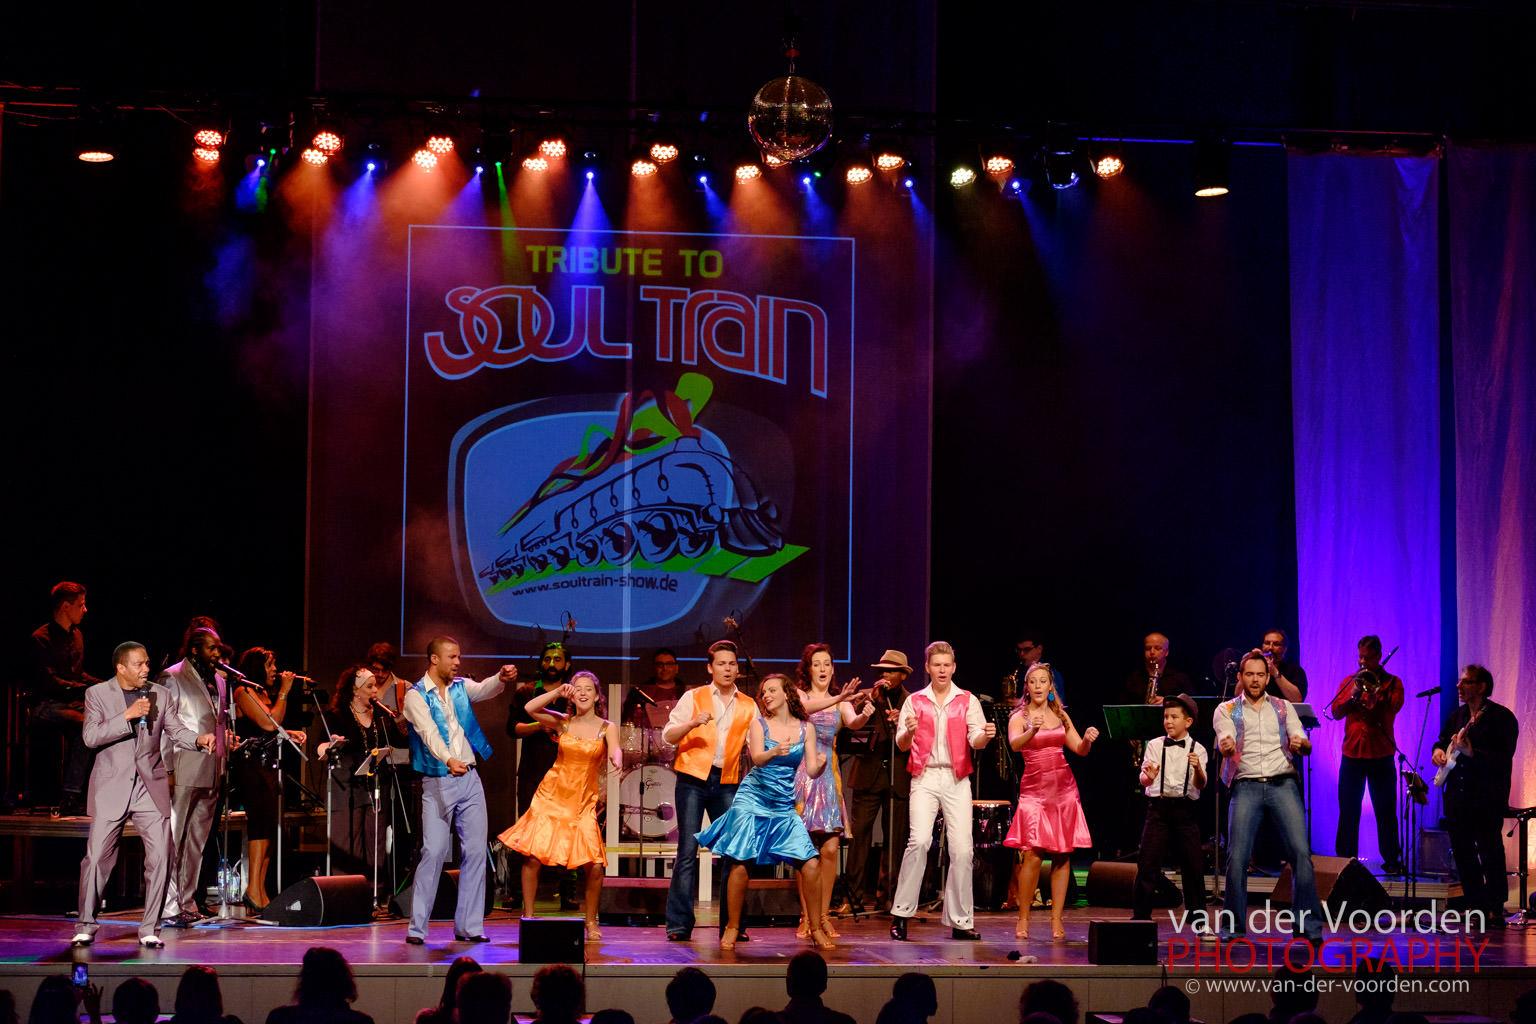 2015 A Tribute to Soul Train @ Palatin Wiesloch